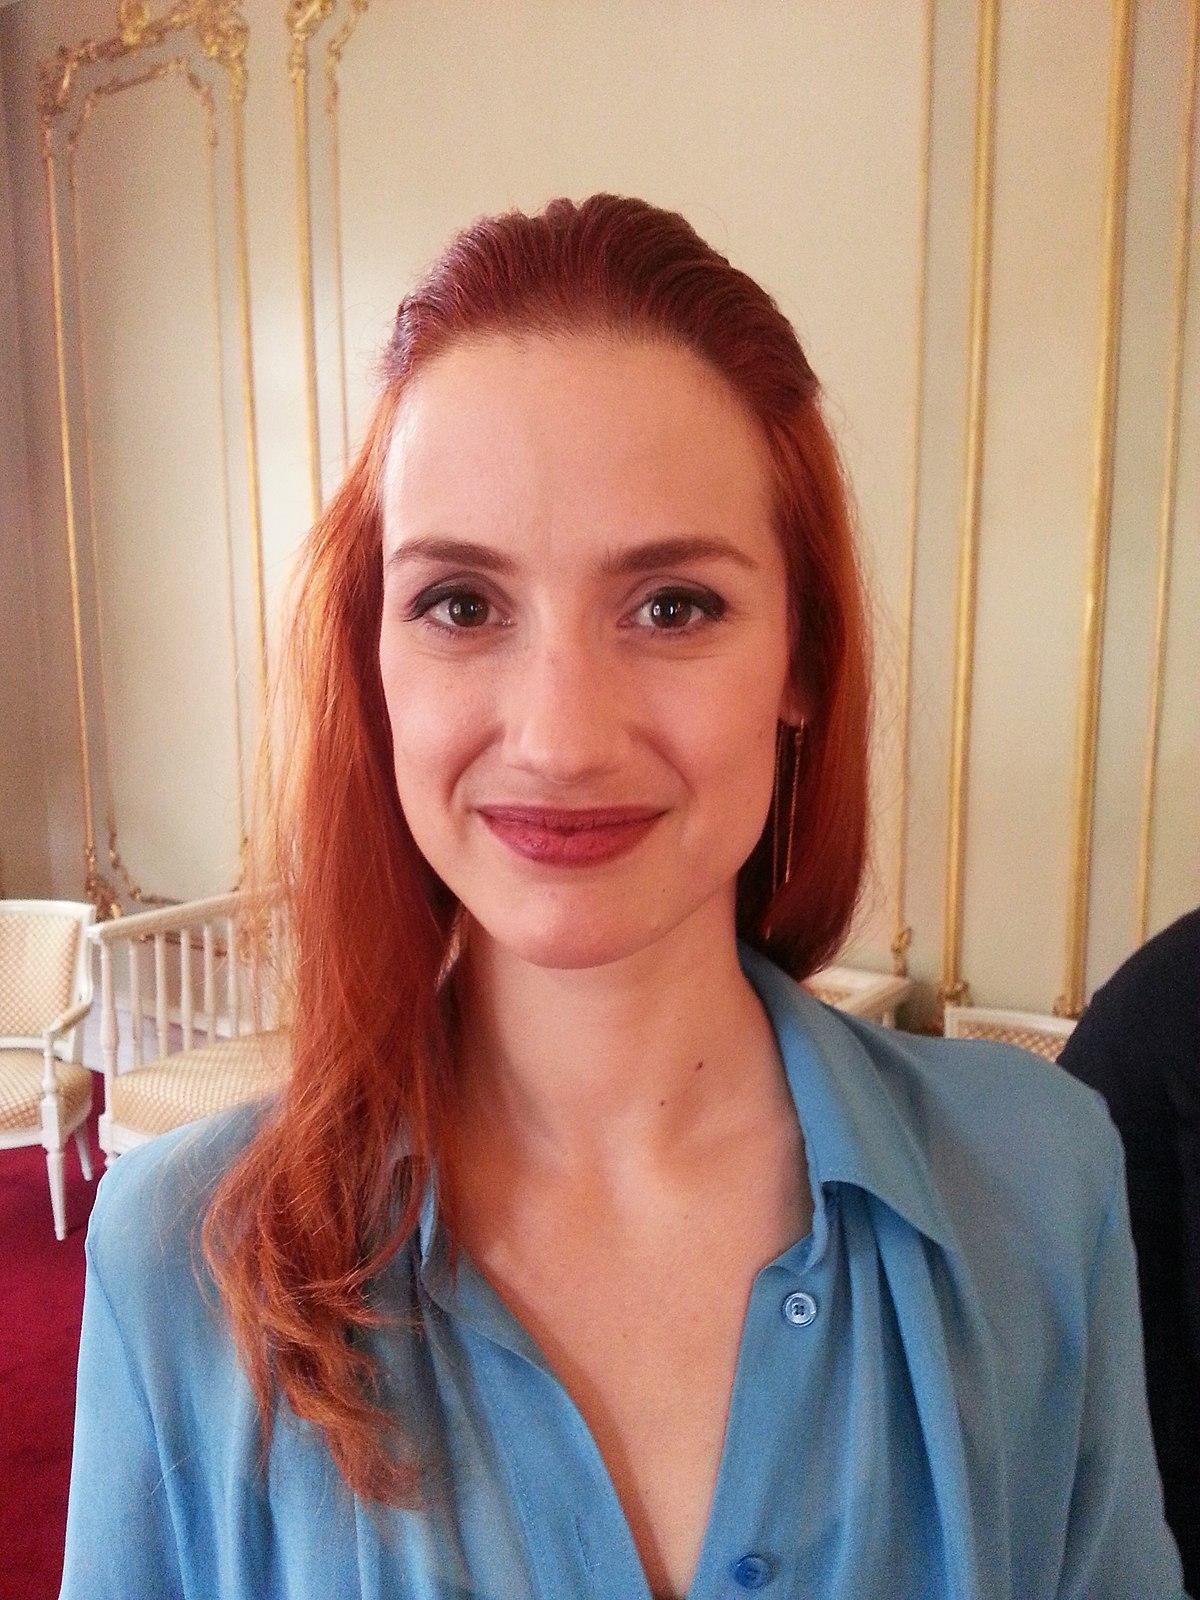 Danica Curcic naked 800